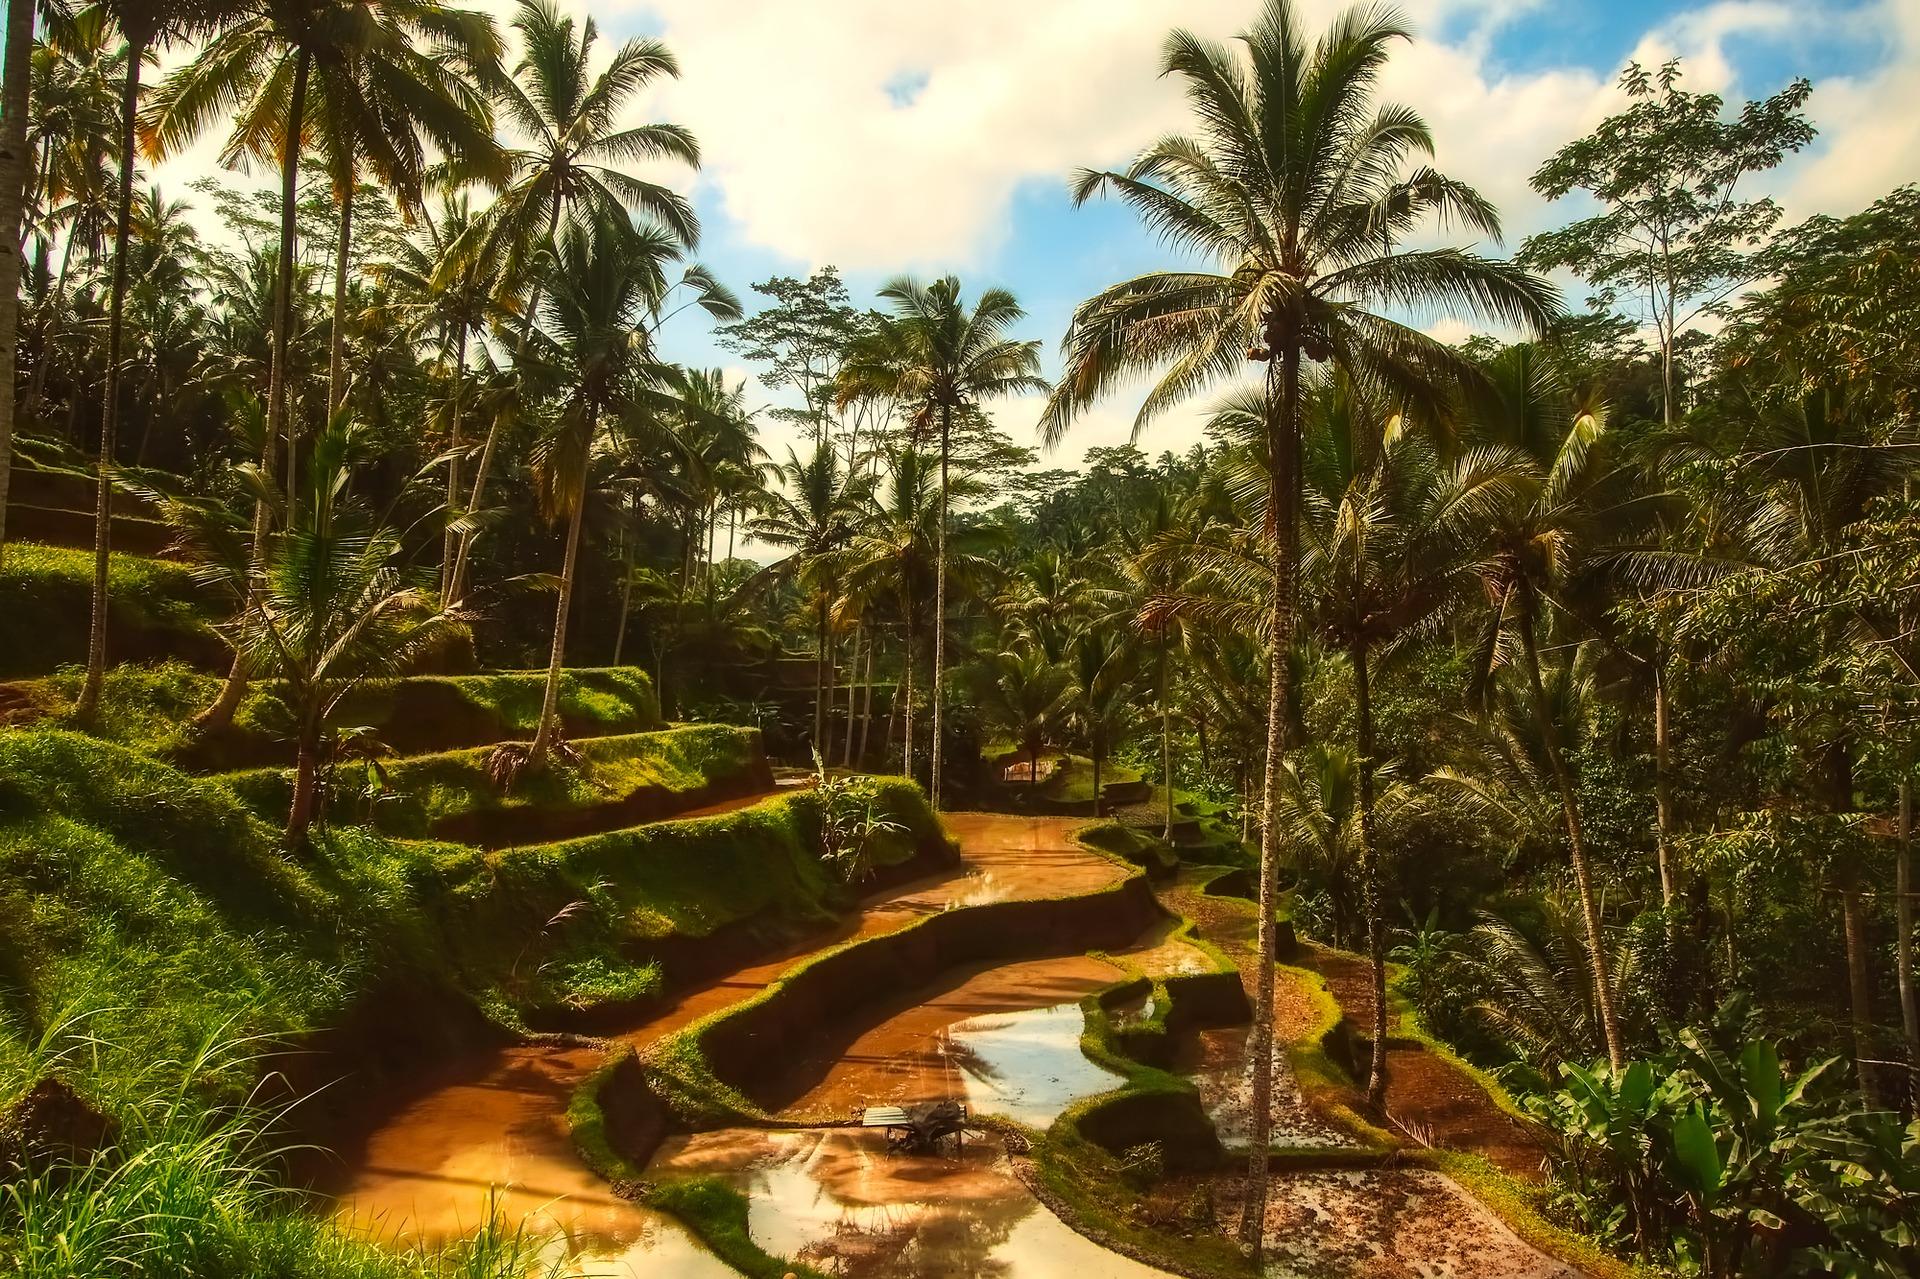 Bali | DigiNo | 10 Best Locations For Digital Nomads